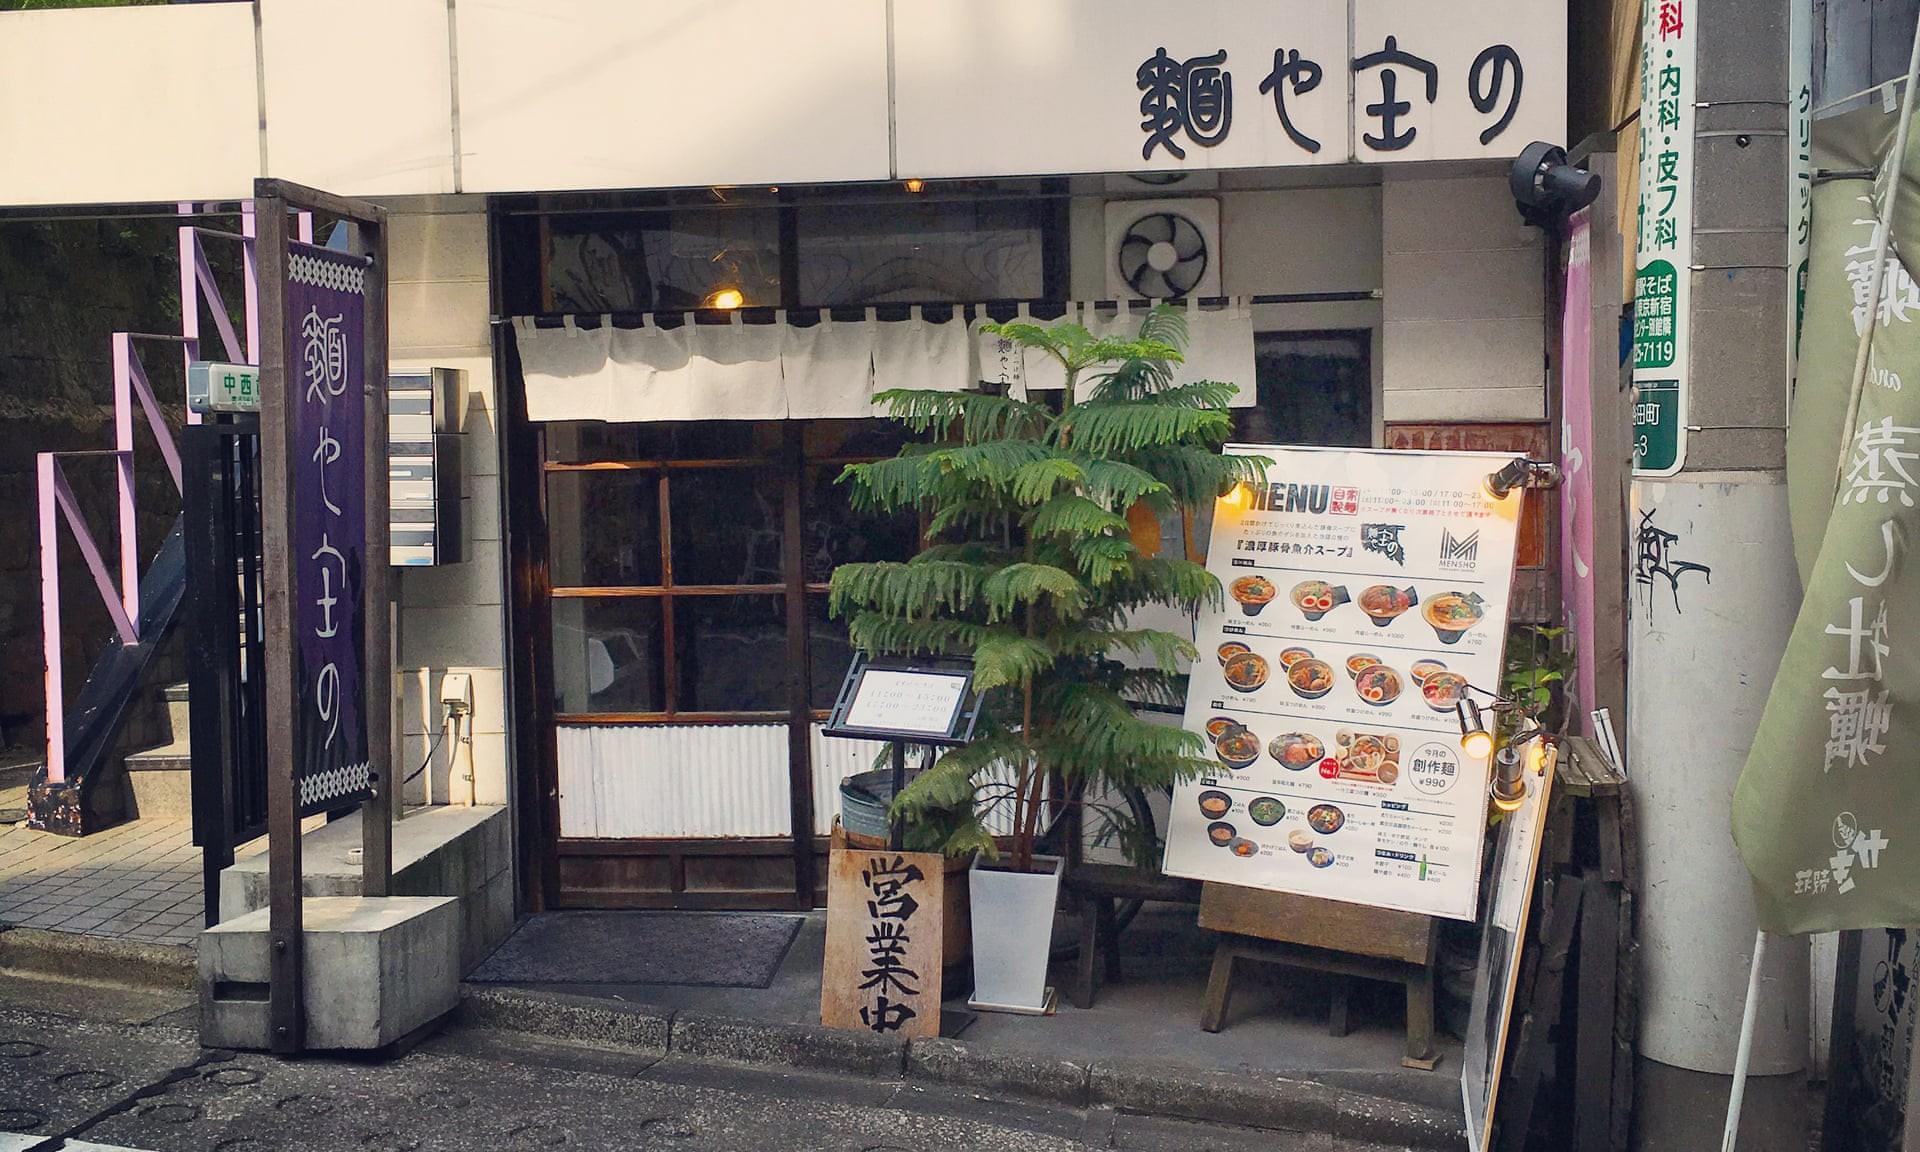 2_Menya Shichisai_ Ramen Beast